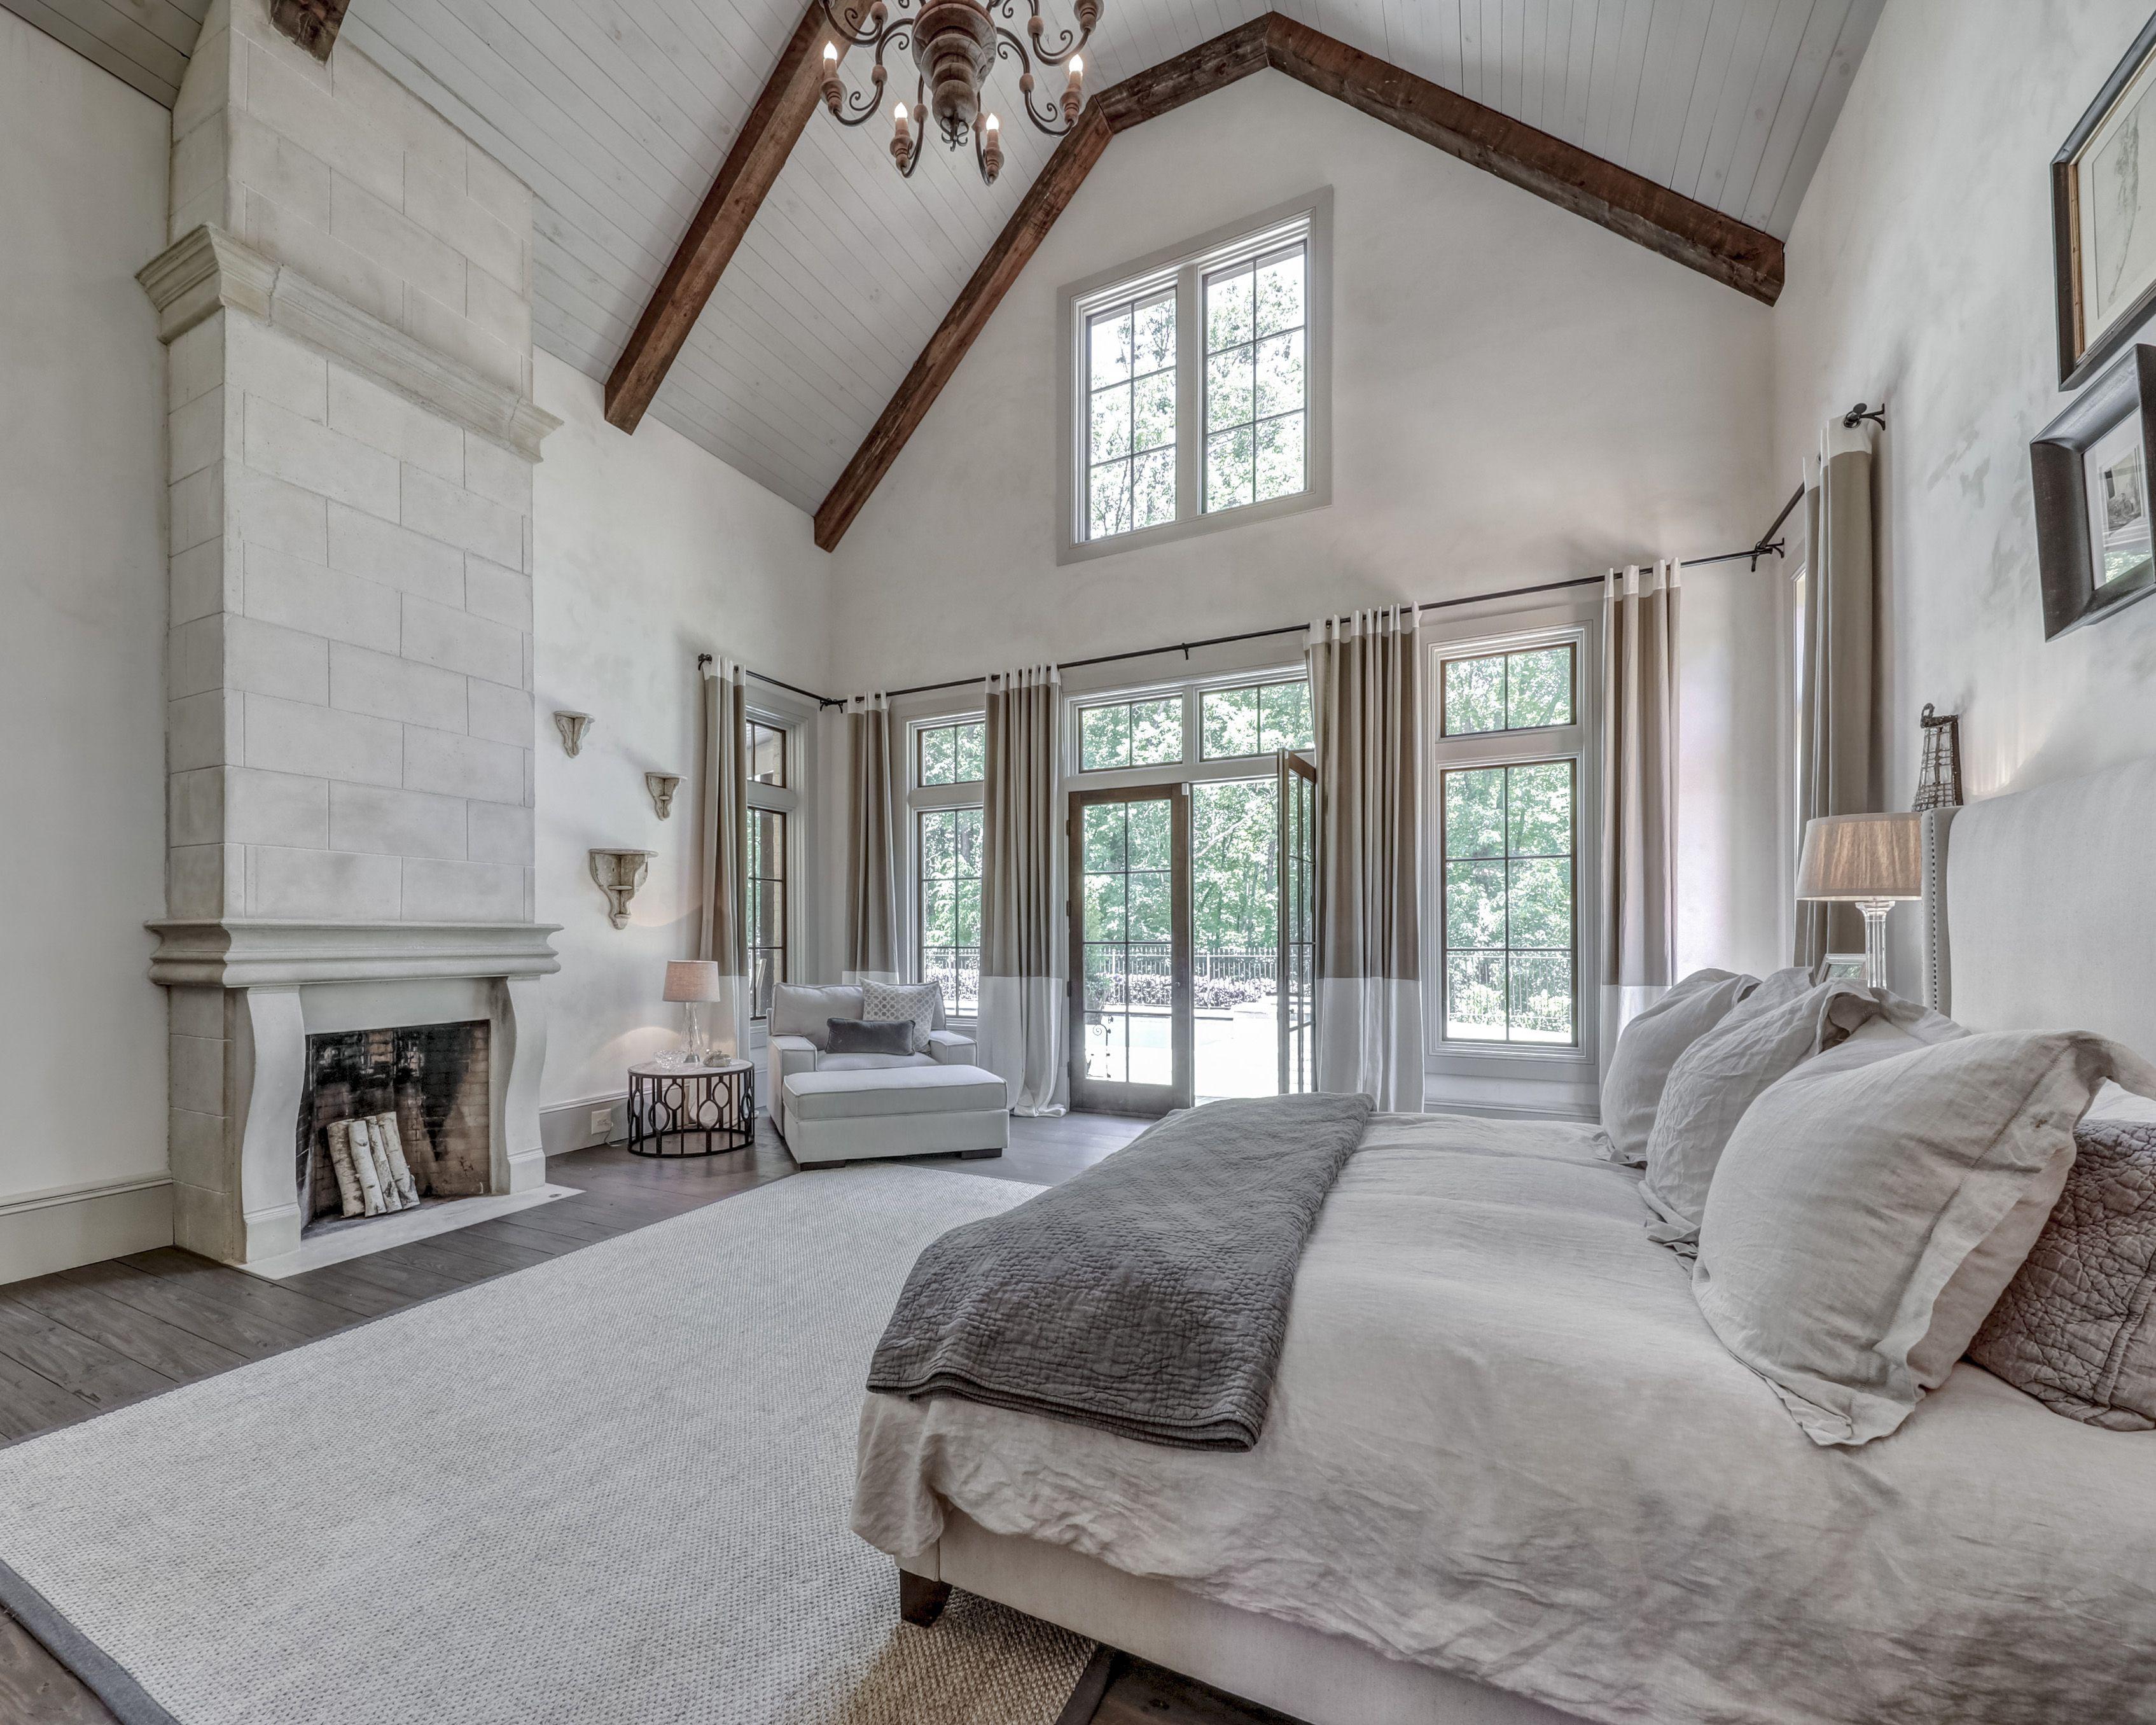 Bedroom For Your Dreams Dream Master Bedroom Home Master Bedroom